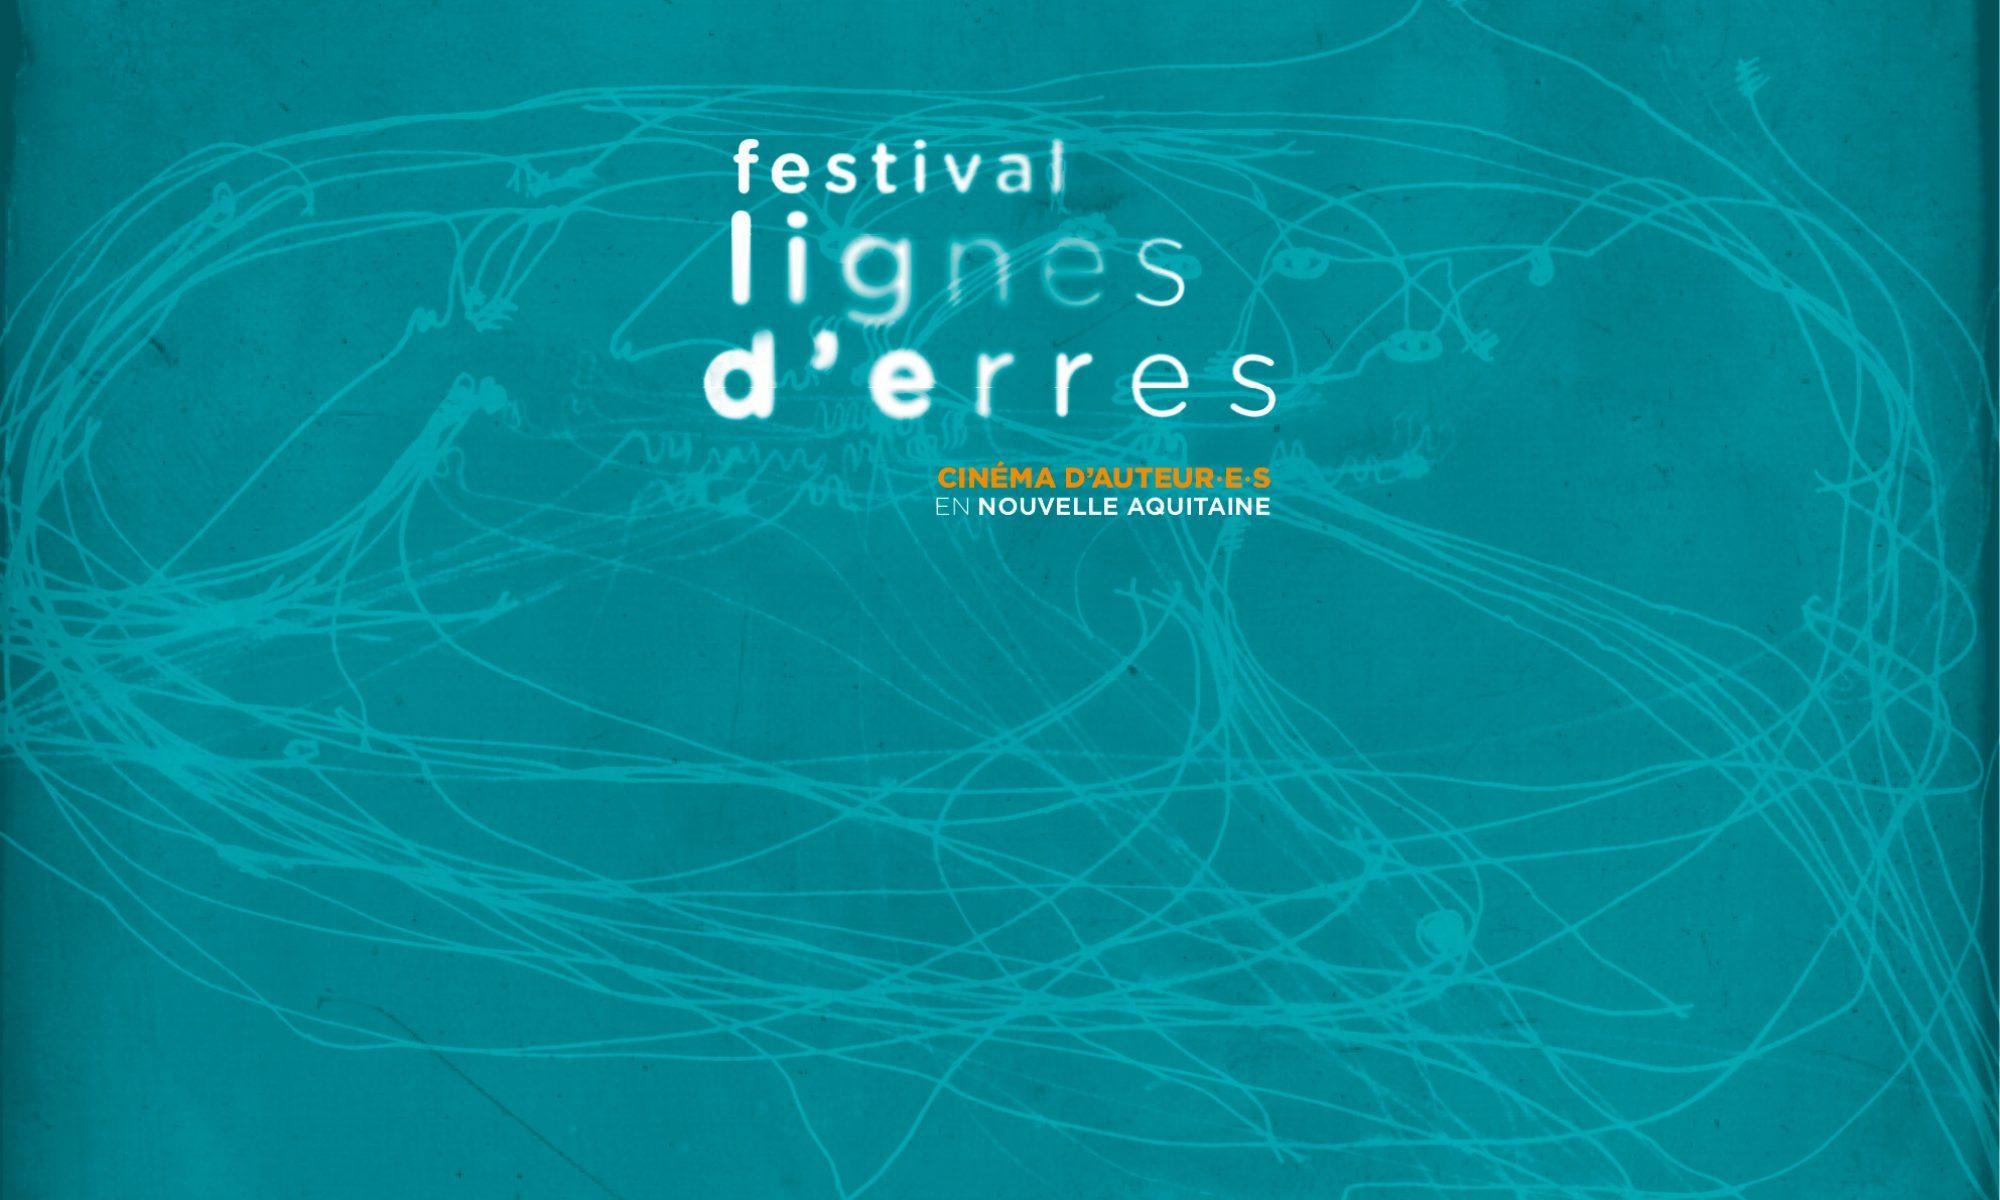 Festival lignes d'erres / 27 > 30 sept. 2018